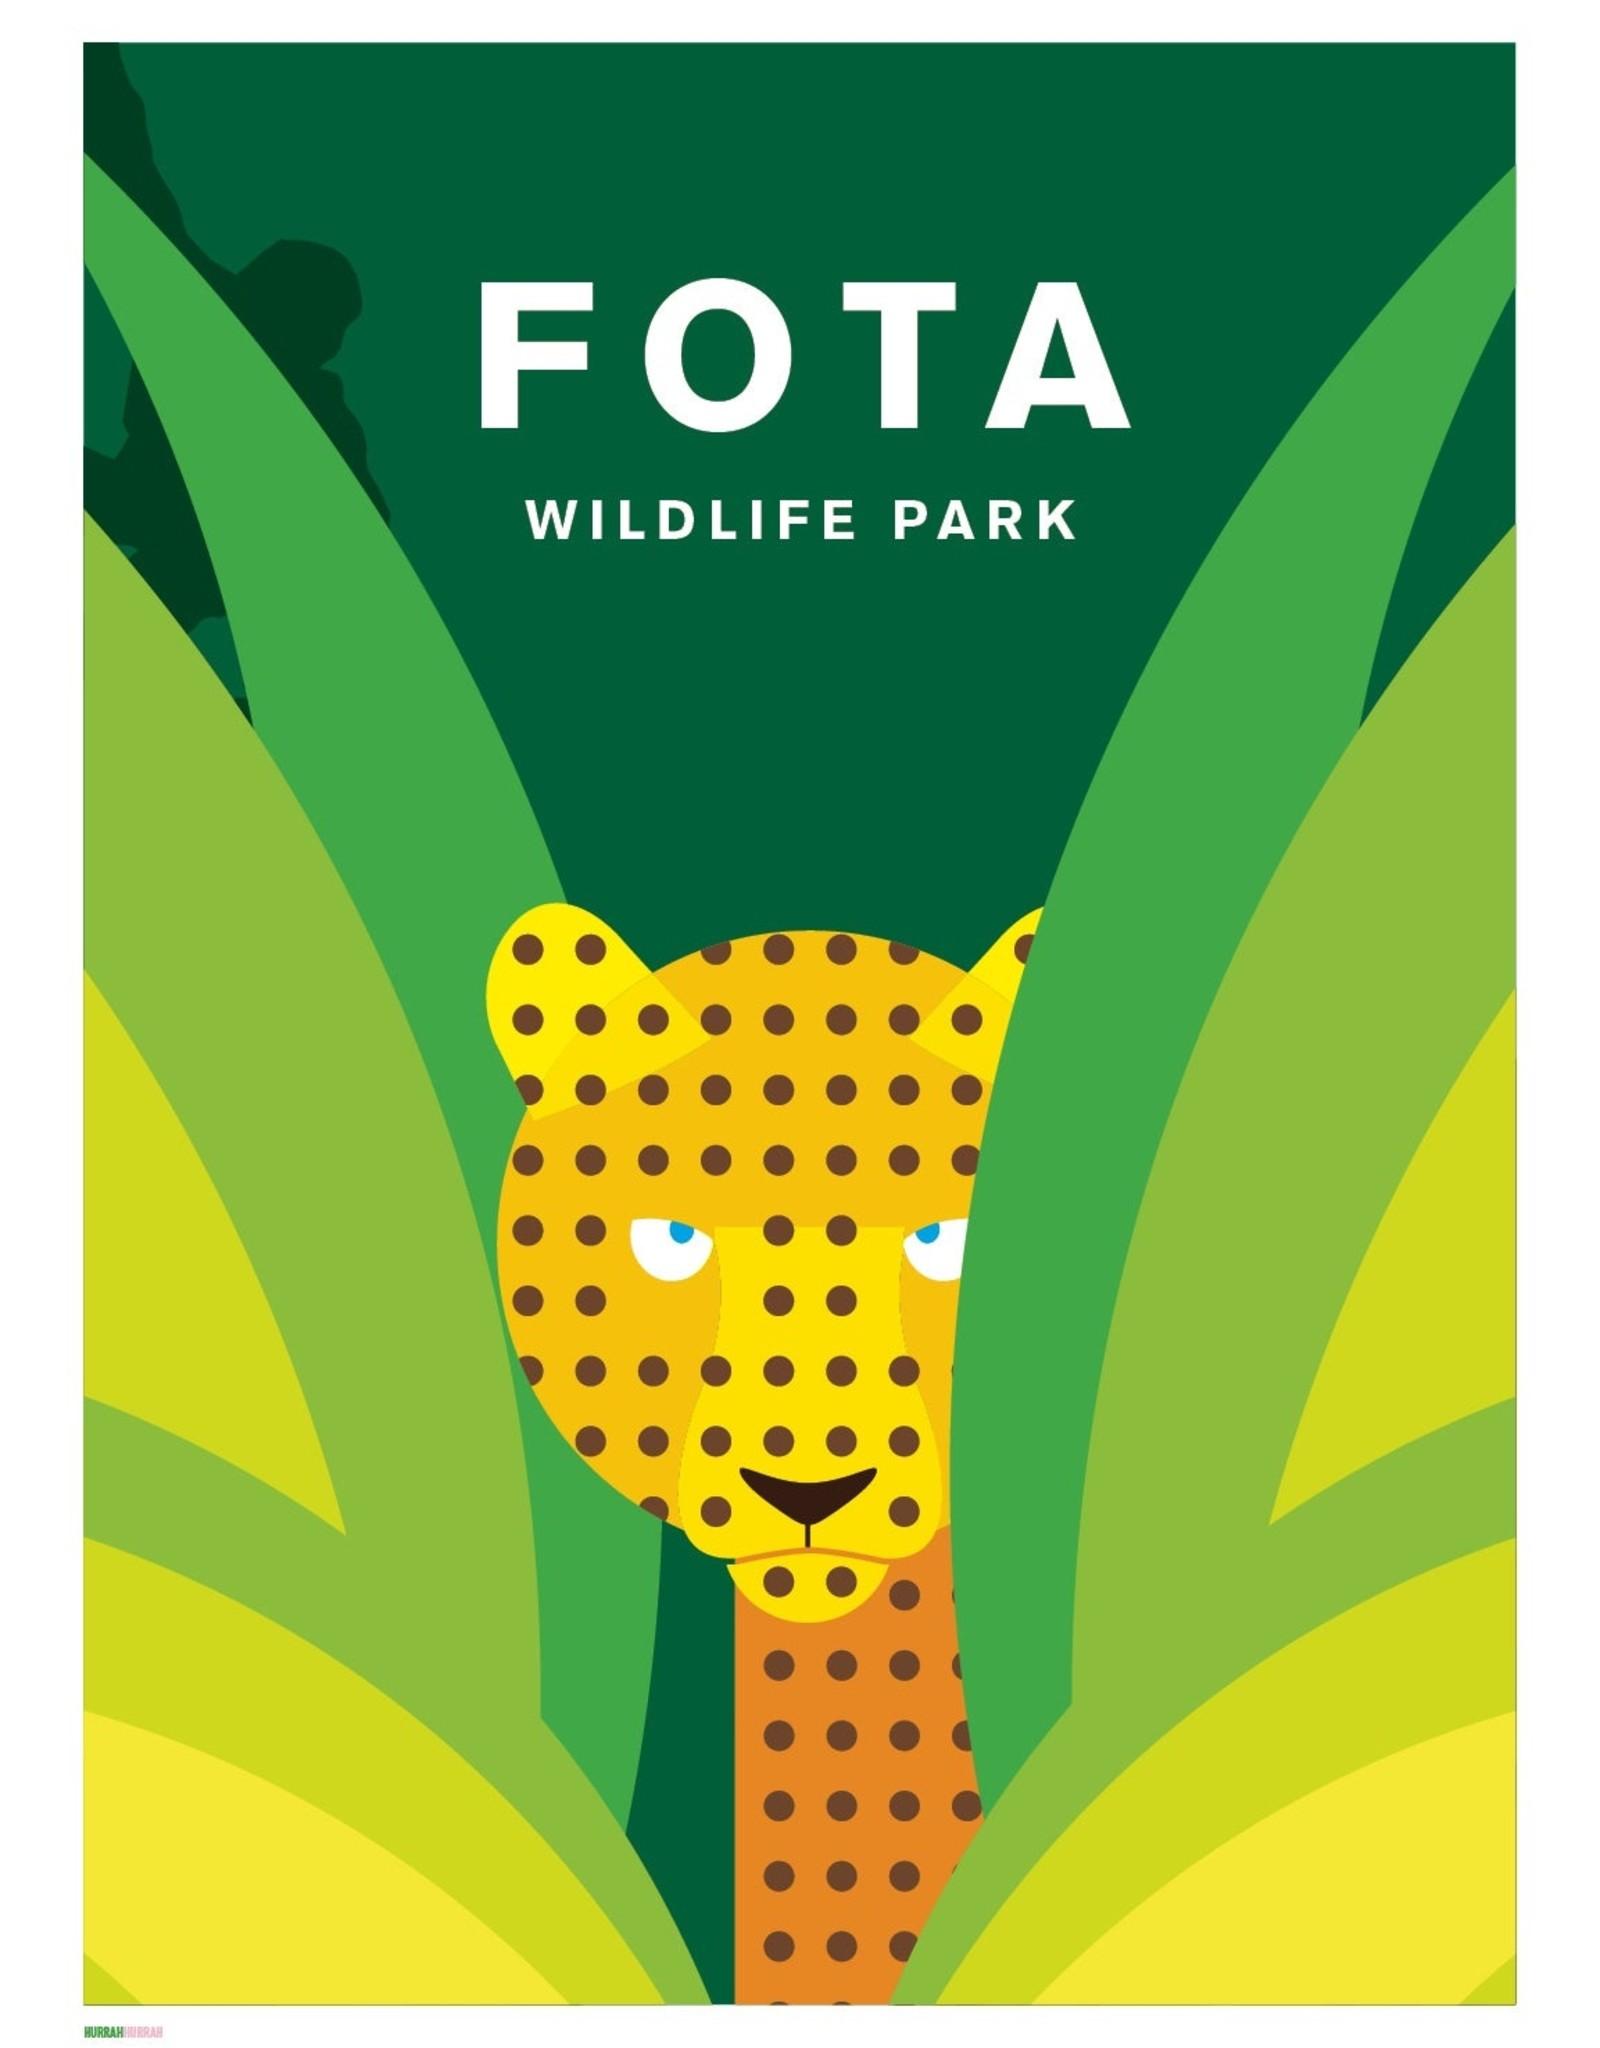 Hurrah Hurrah Hurrah Hurrah Print Fota Wildlife Park